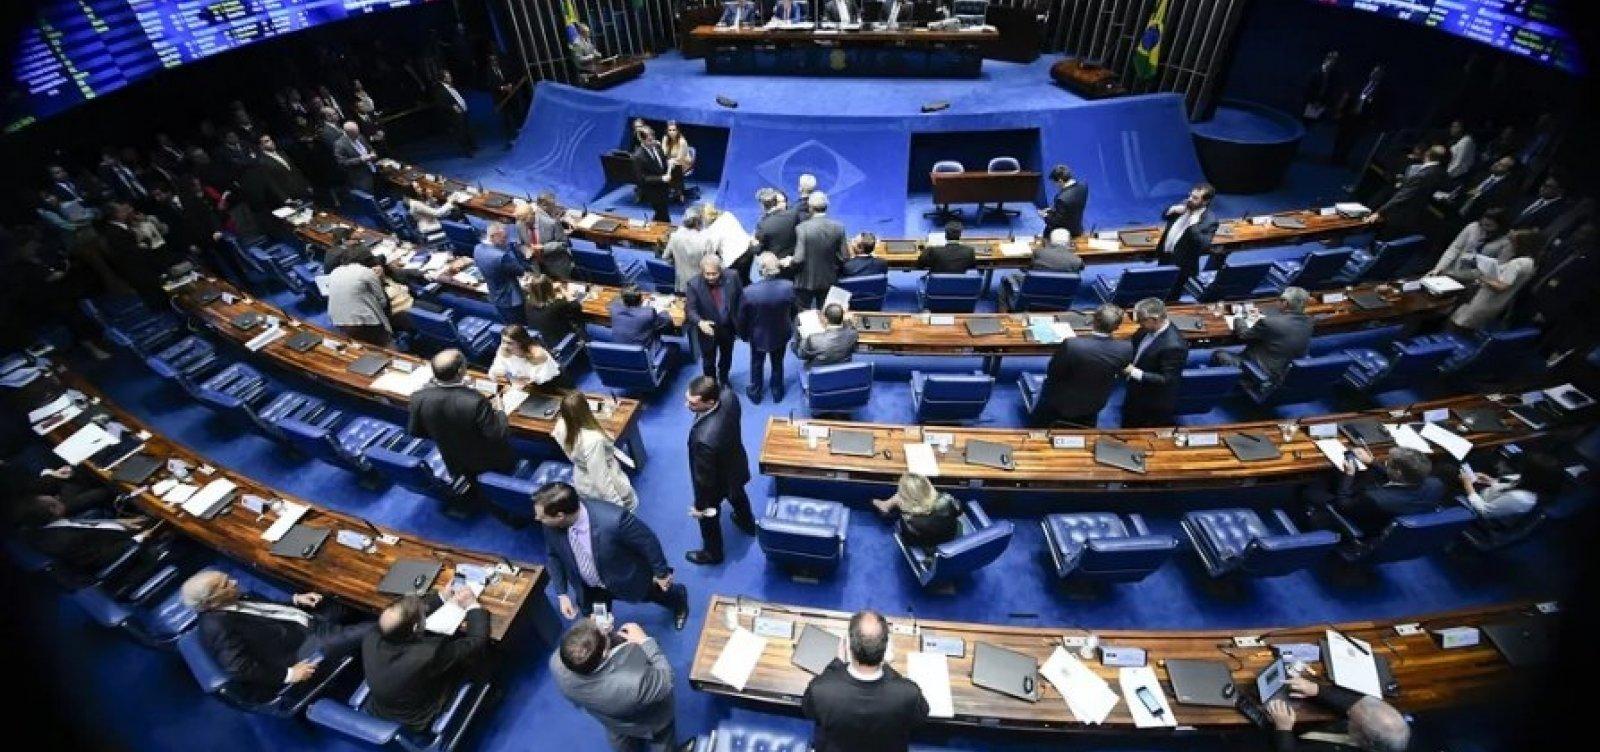 [Por 47 votos a 18, Senado aprova derrubada do decreto das armas de Bolsonaro]